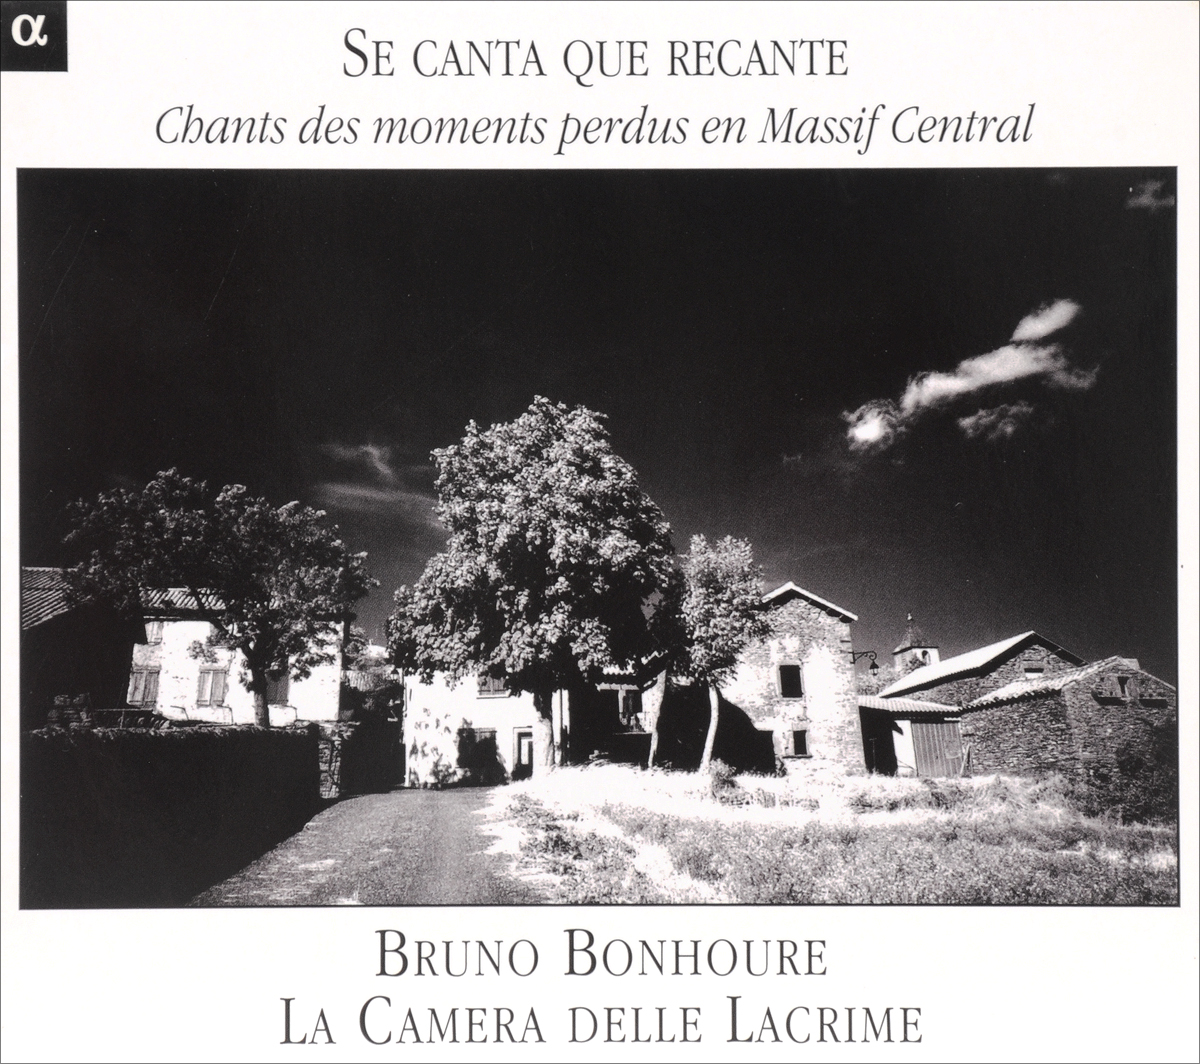 Исполнитель: VARIOUSАльбом: SE CANTA QUE RECANTE: SONGS FOR PASTIME IN THE MASSIF CENTRAL/ENSEMBLE LA CAMERA DELLE LACRIME/BRUNO BONHOURE/JEAN-LUC TAMBY, LUTH RENAISSANCE & MANDORAПроизводитель: ALPHA